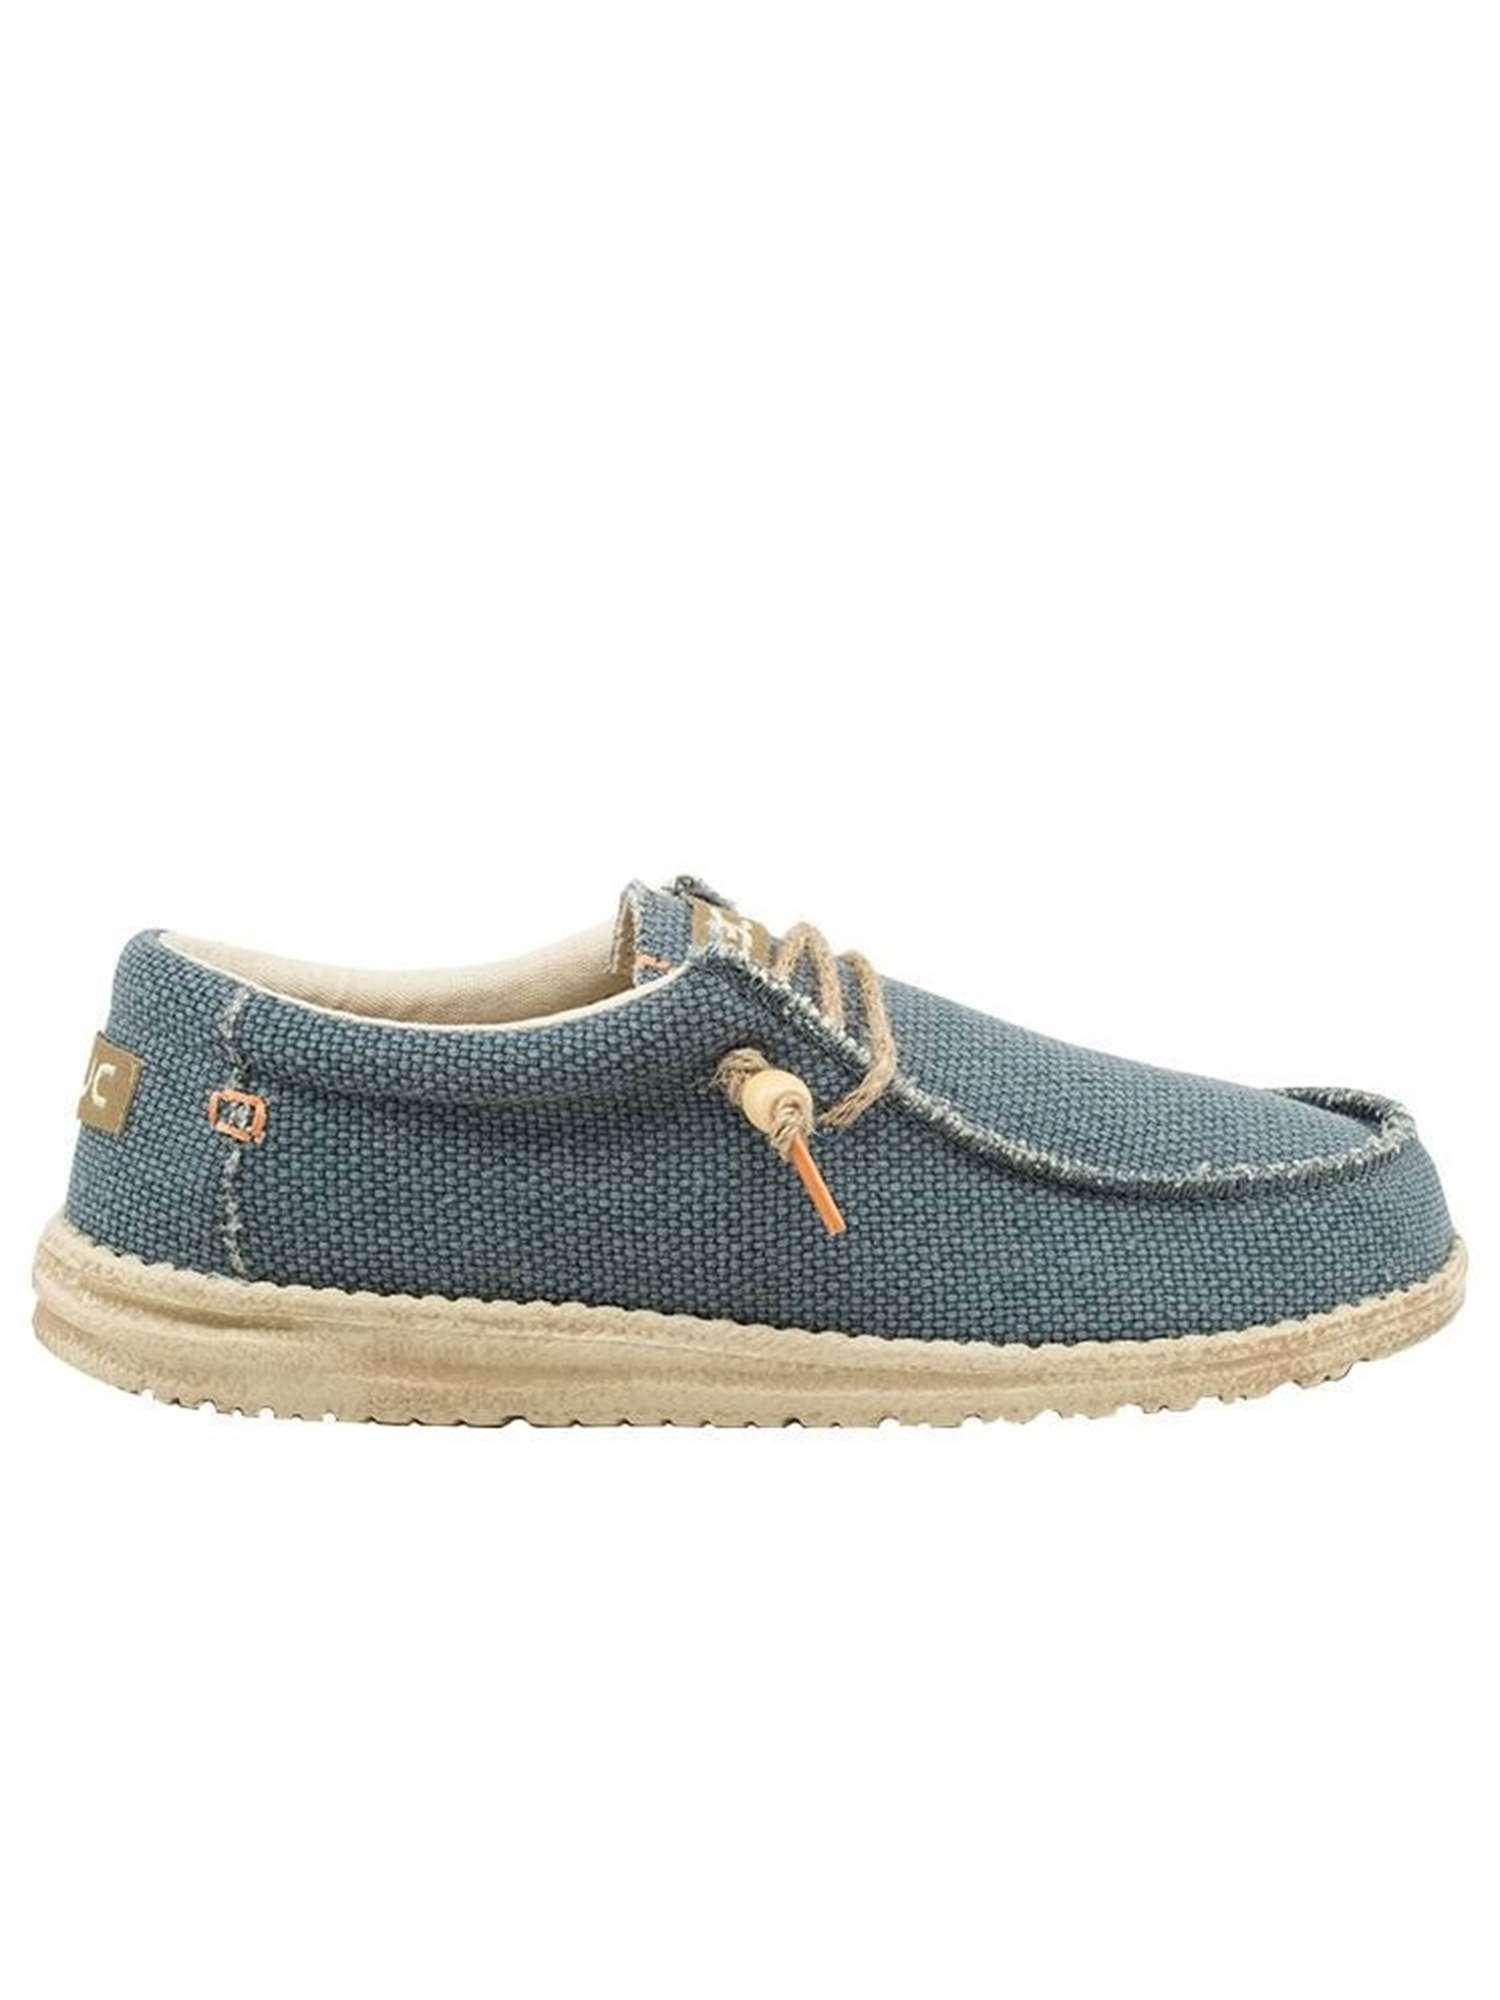 Dude Lacci Jeans | Lacci Uomo Tessuto | Tania Calzature Bari